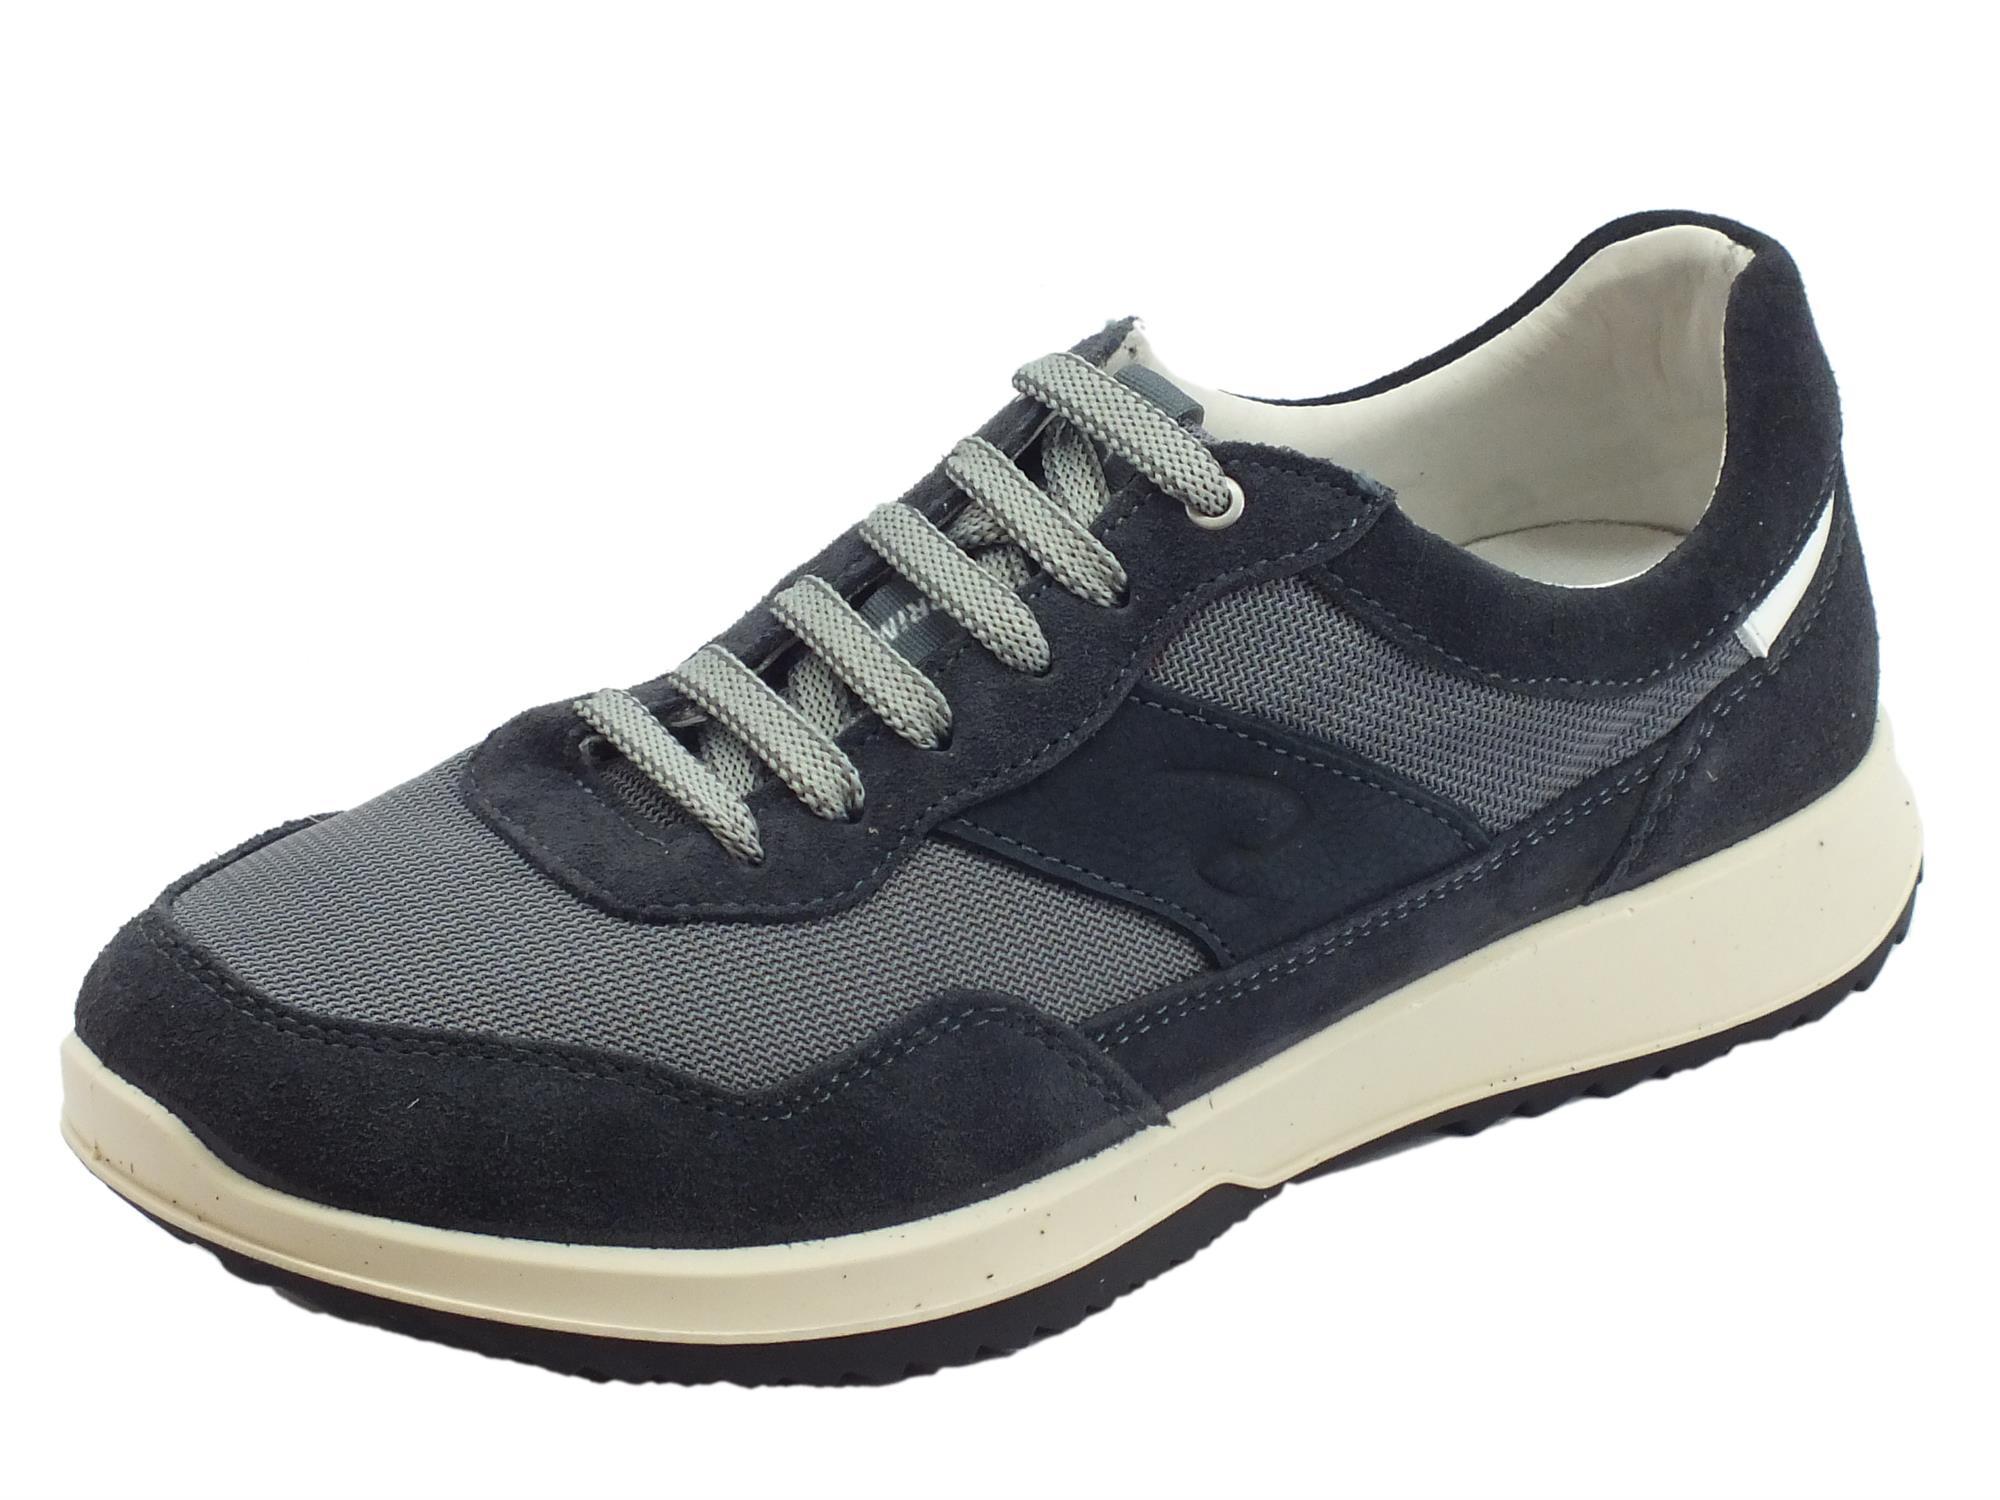 7996841714ff Grisport 43409V15 Deep Vesuvio scarpe uomo in nabuk e tessuto blu  antistatica